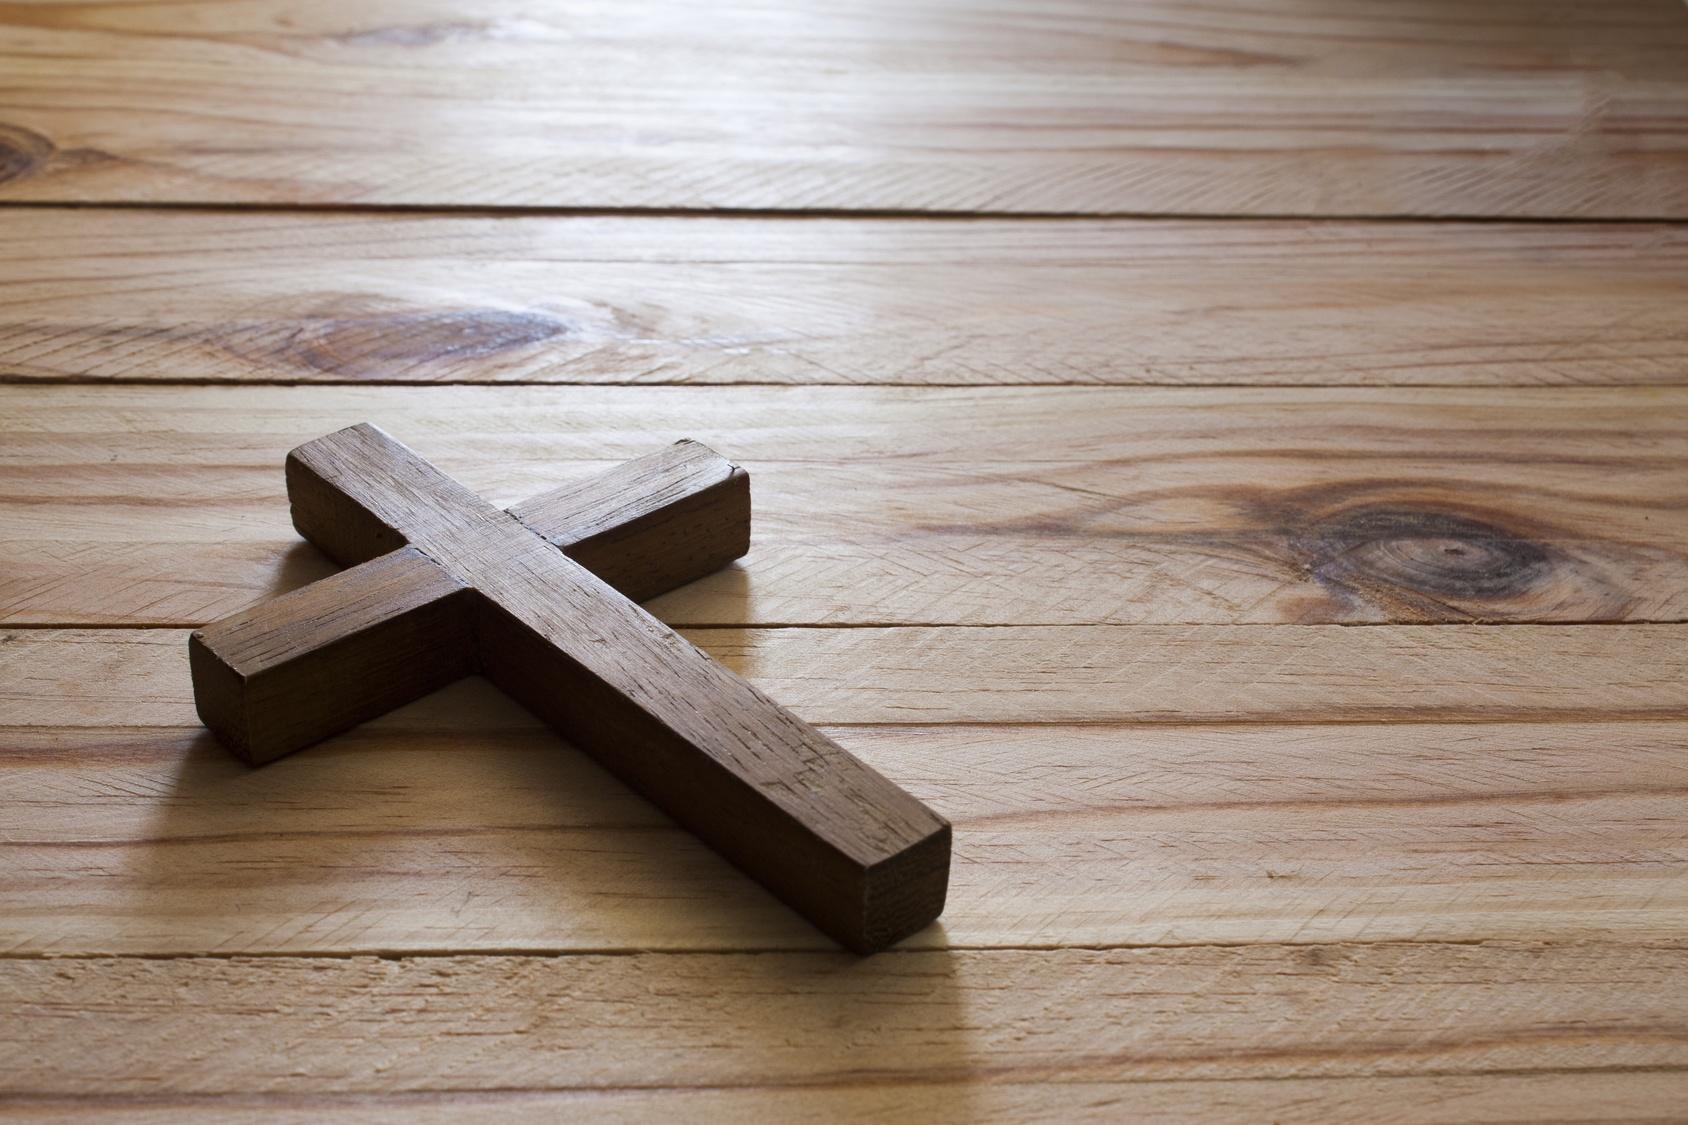 Fotolia Cross on wood.jpg